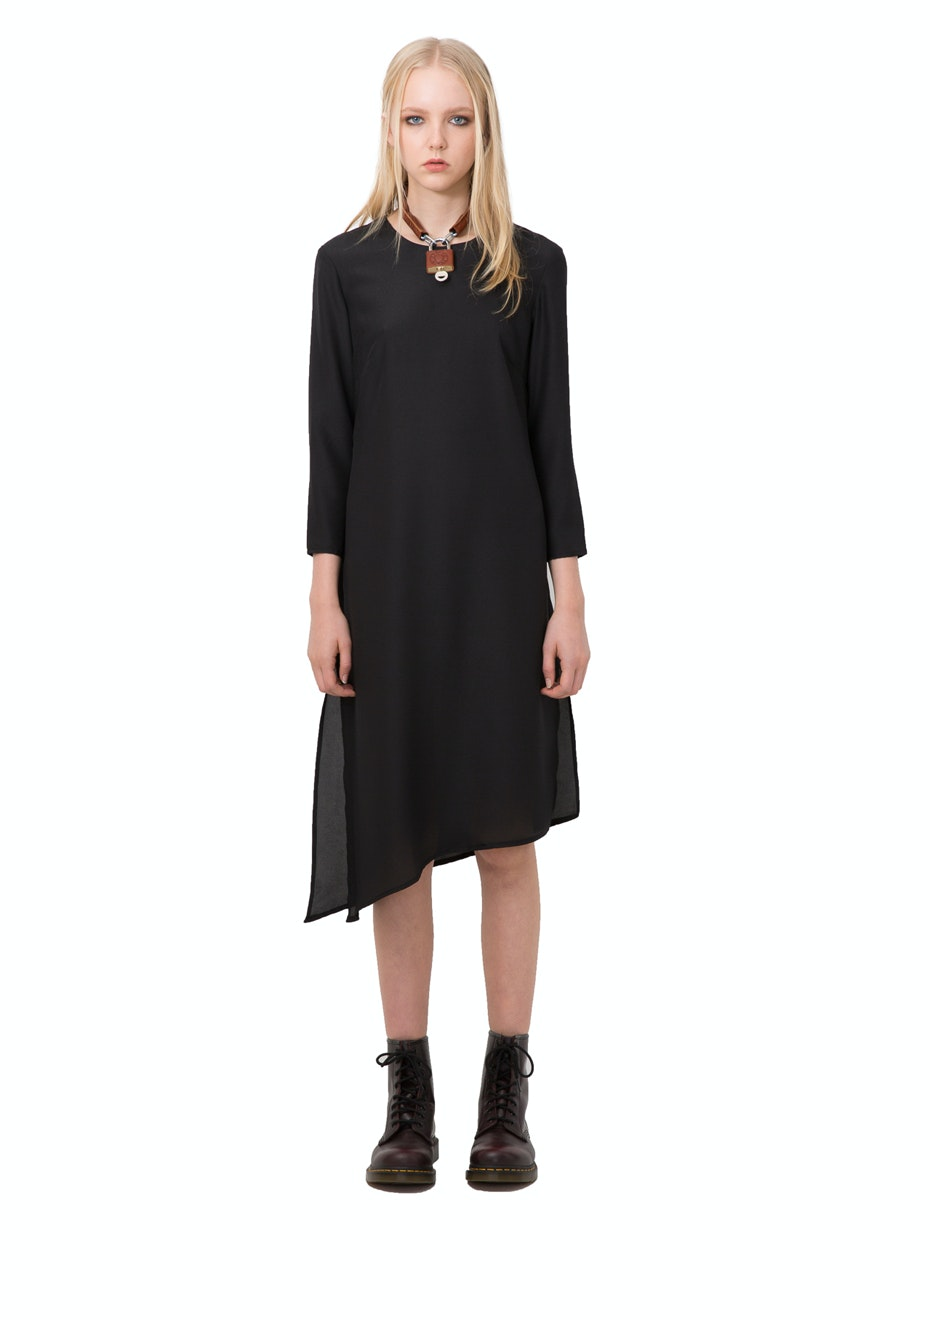 Stolen Girlfriends Club - Thigh Master Dress - Black